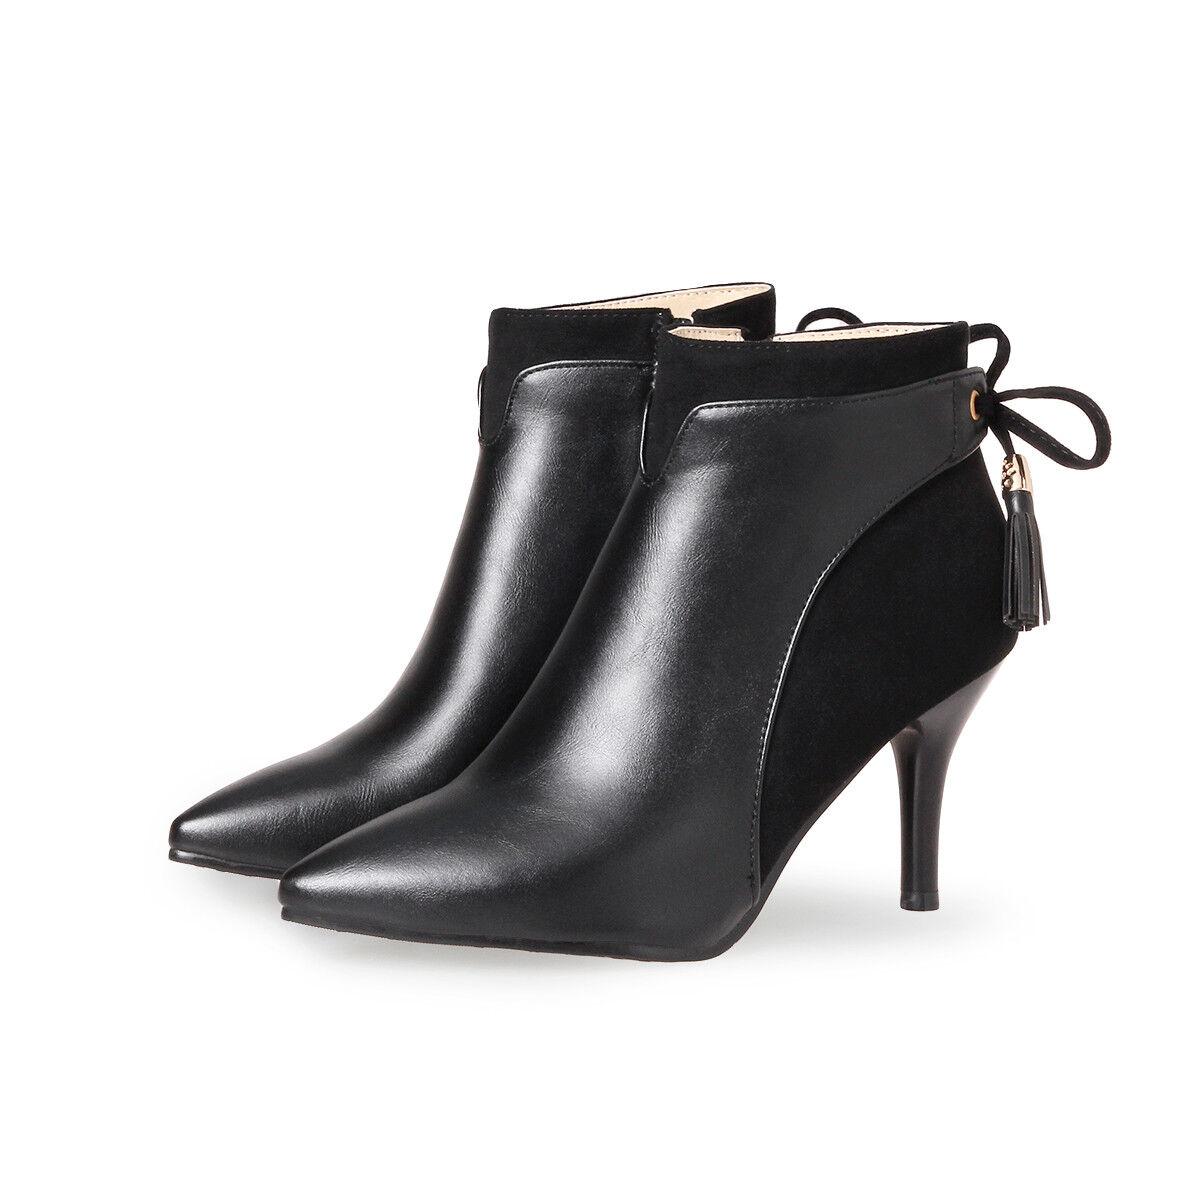 Damen Schuhe Pumps High Heels Fashion Boots top Stiefeletten Spitz 32-46 Party top Boots 61bb83